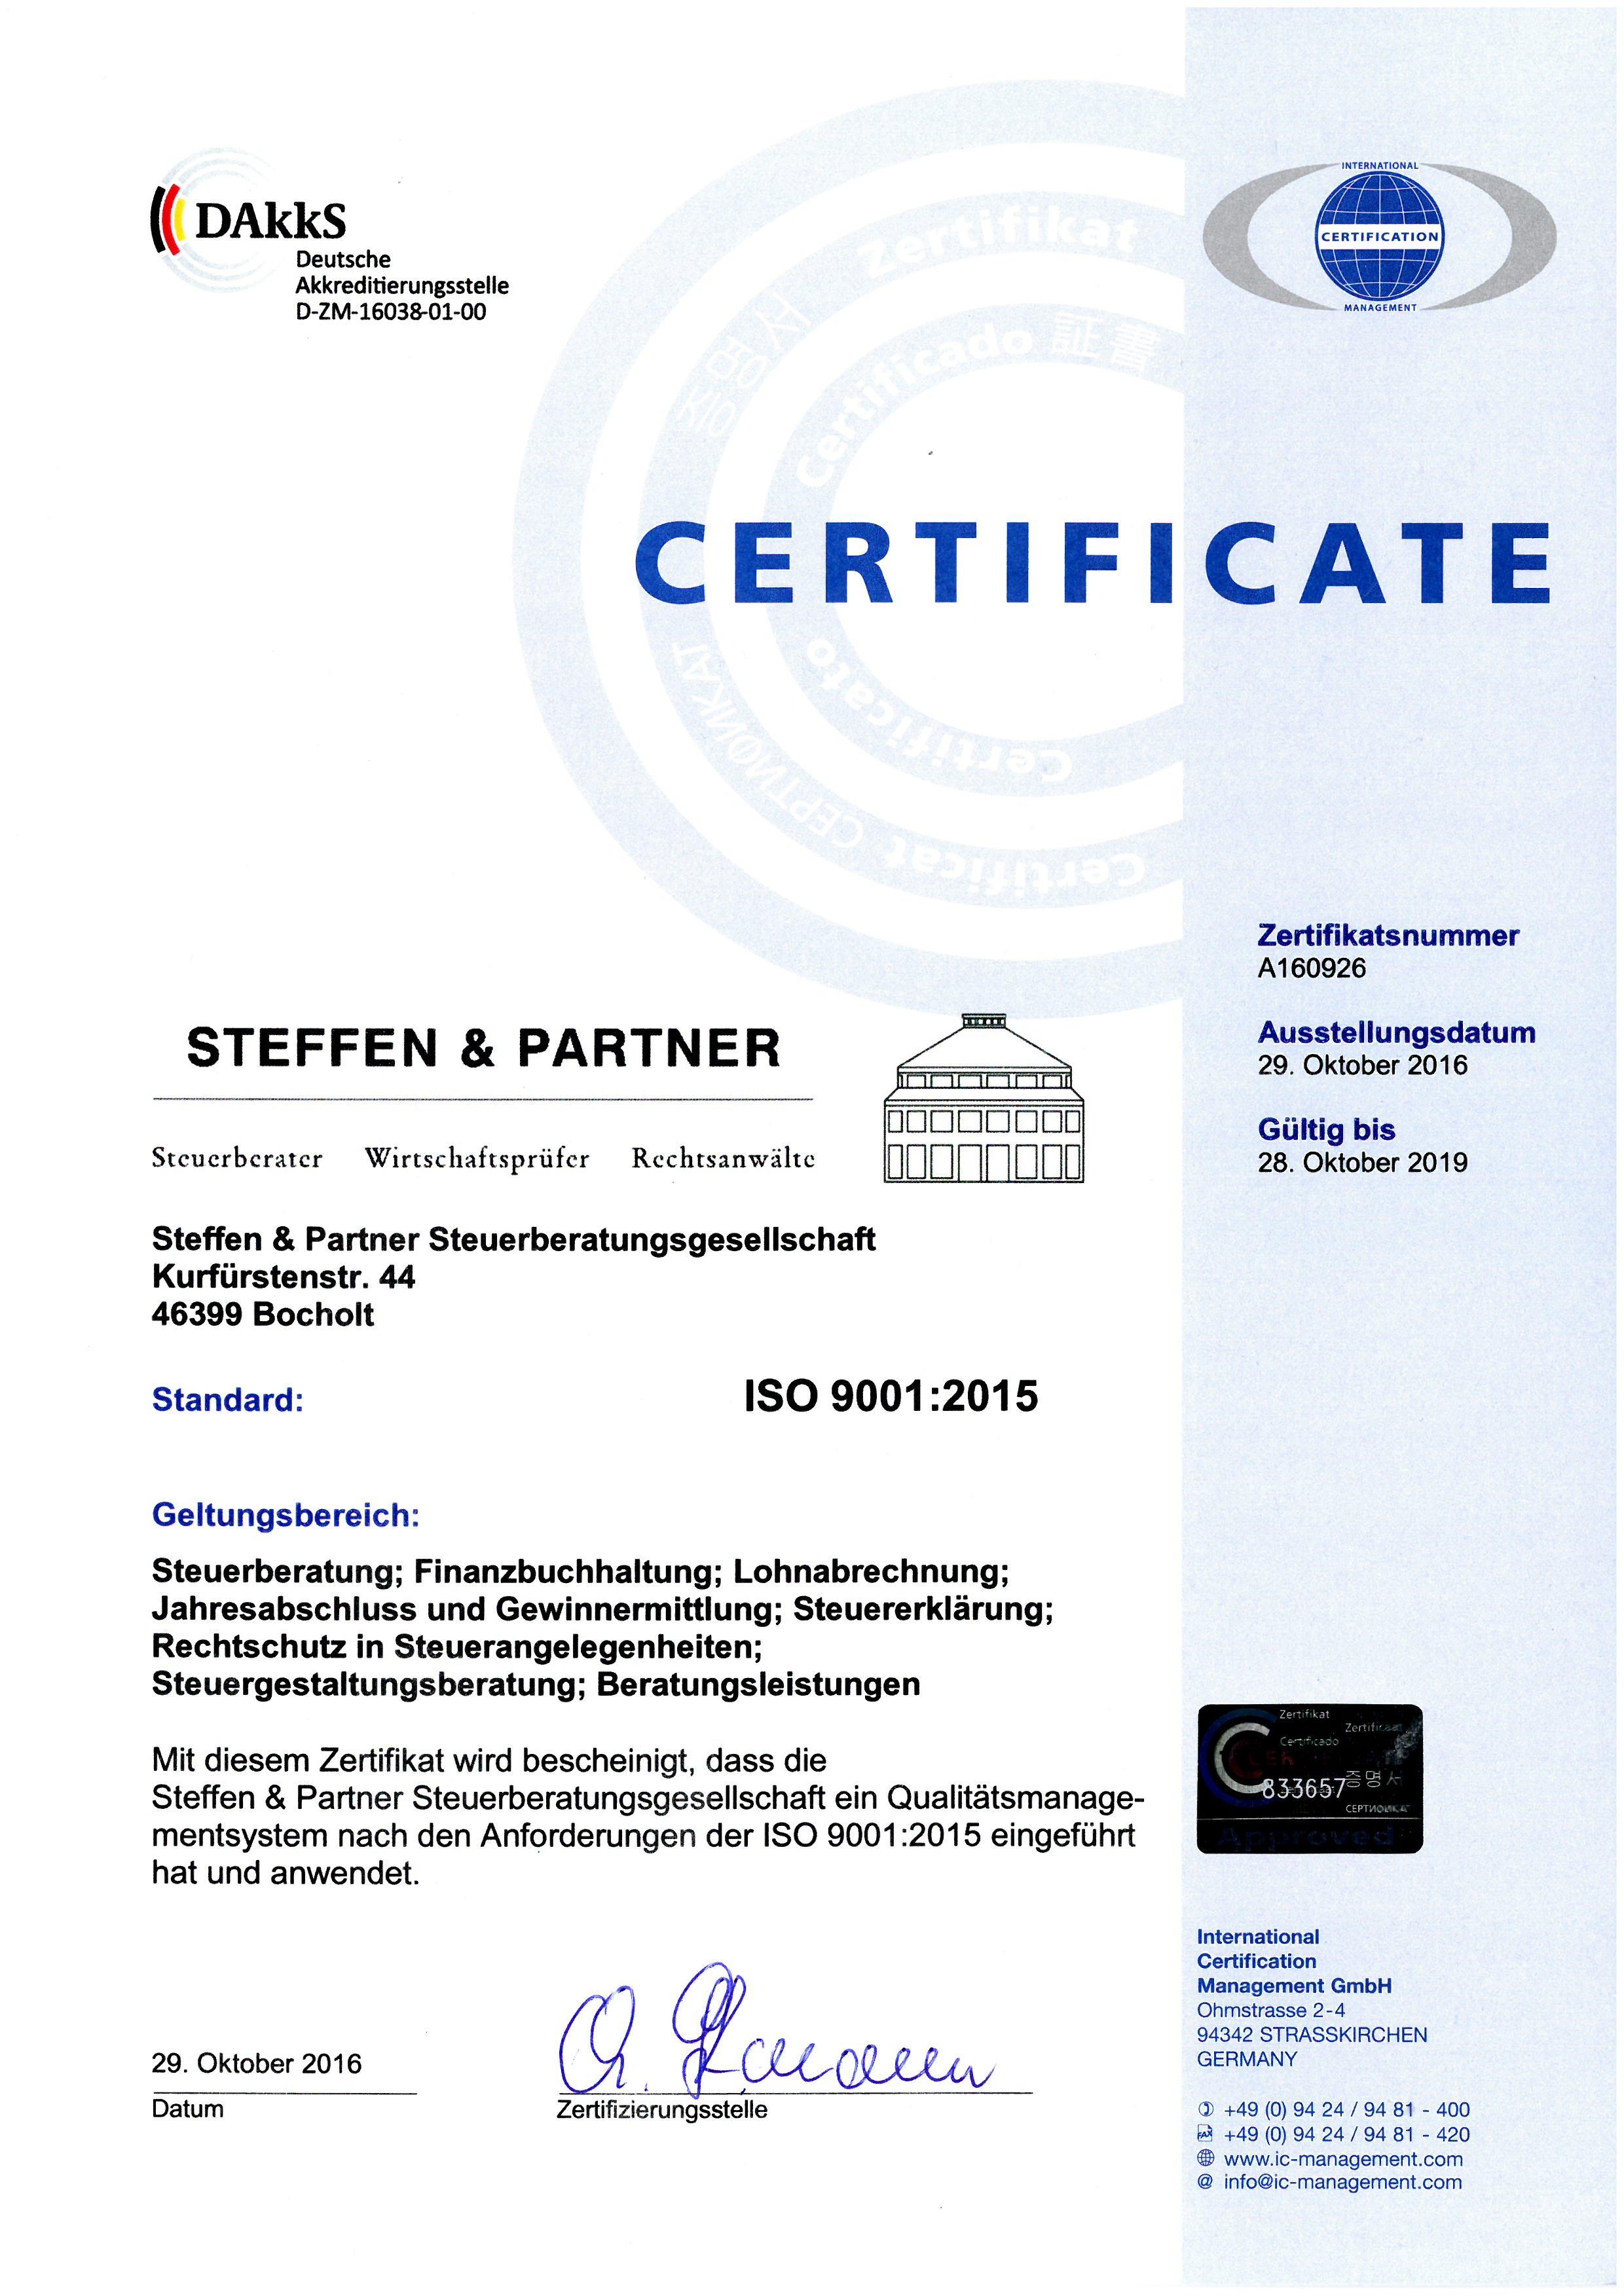 1_zertifikat_iso_steffen_partner-steuerberatung-iso-9001_2015_a160926_gueltig-bis-28-10-19